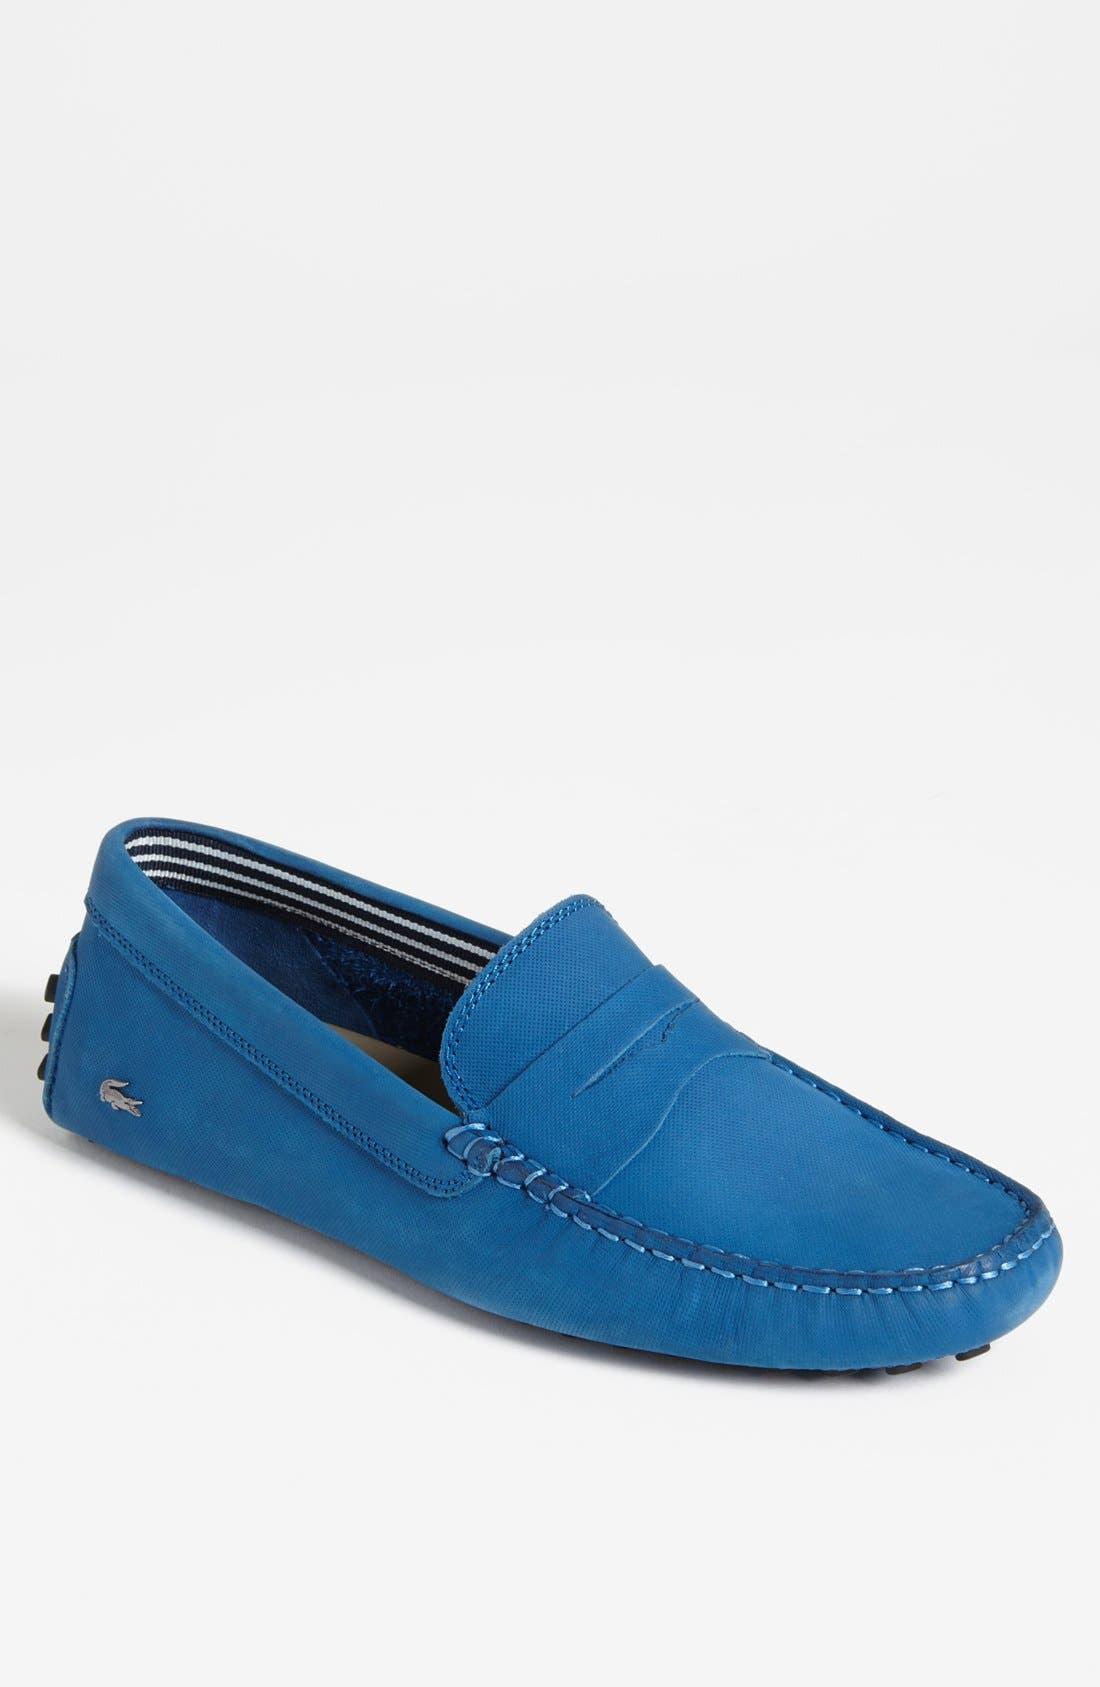 Main Image - Lacoste 'Concours 8' Driving Shoe